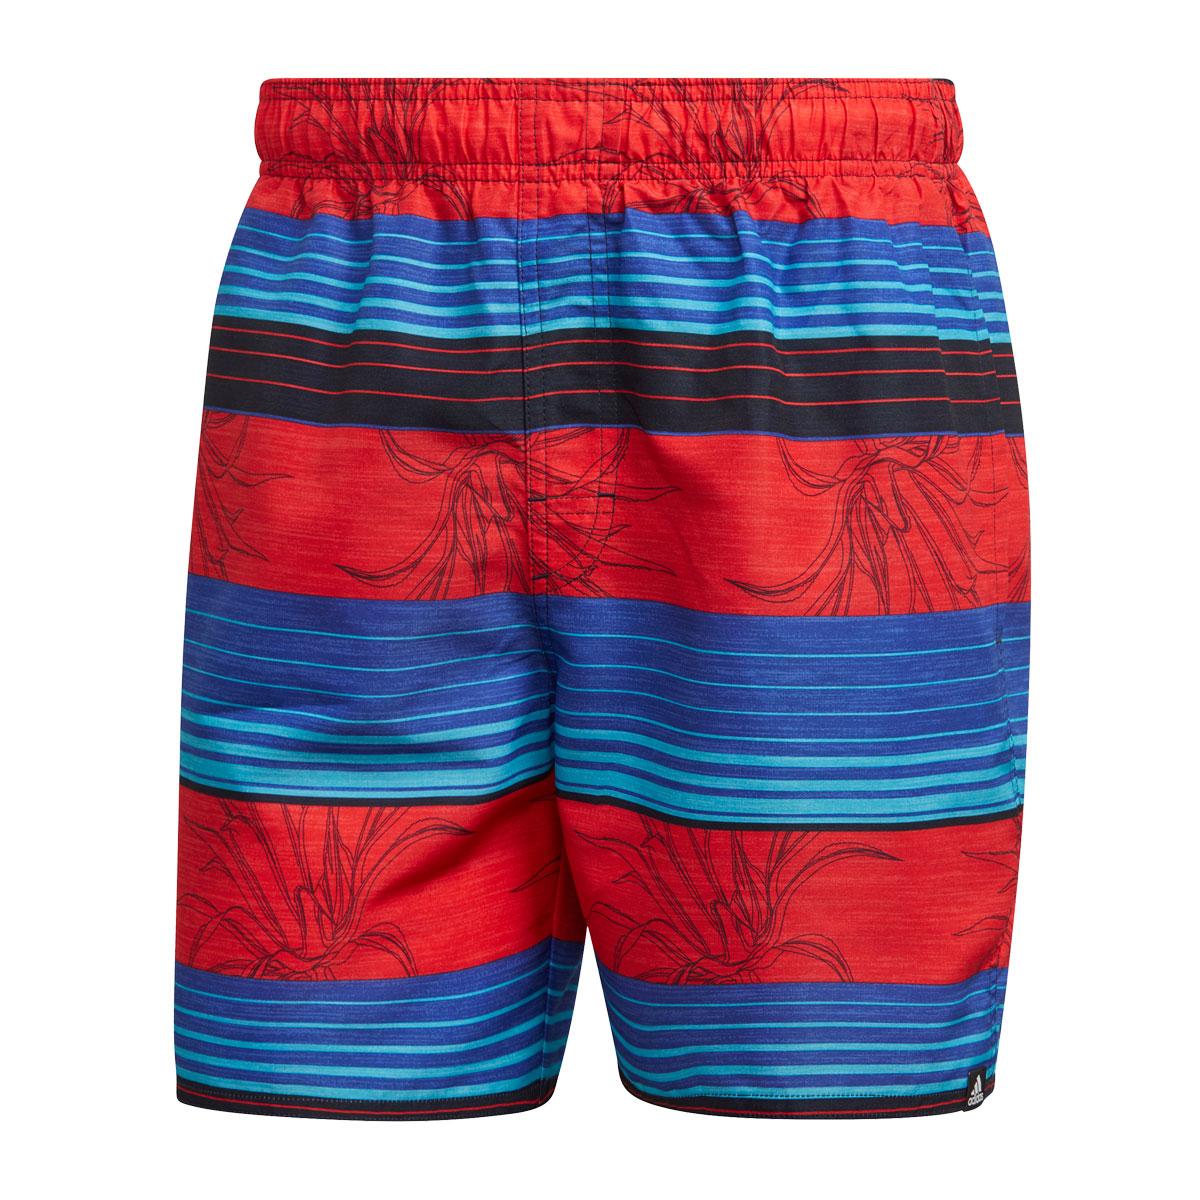 adidas Short Stripe Badehose rot/blau